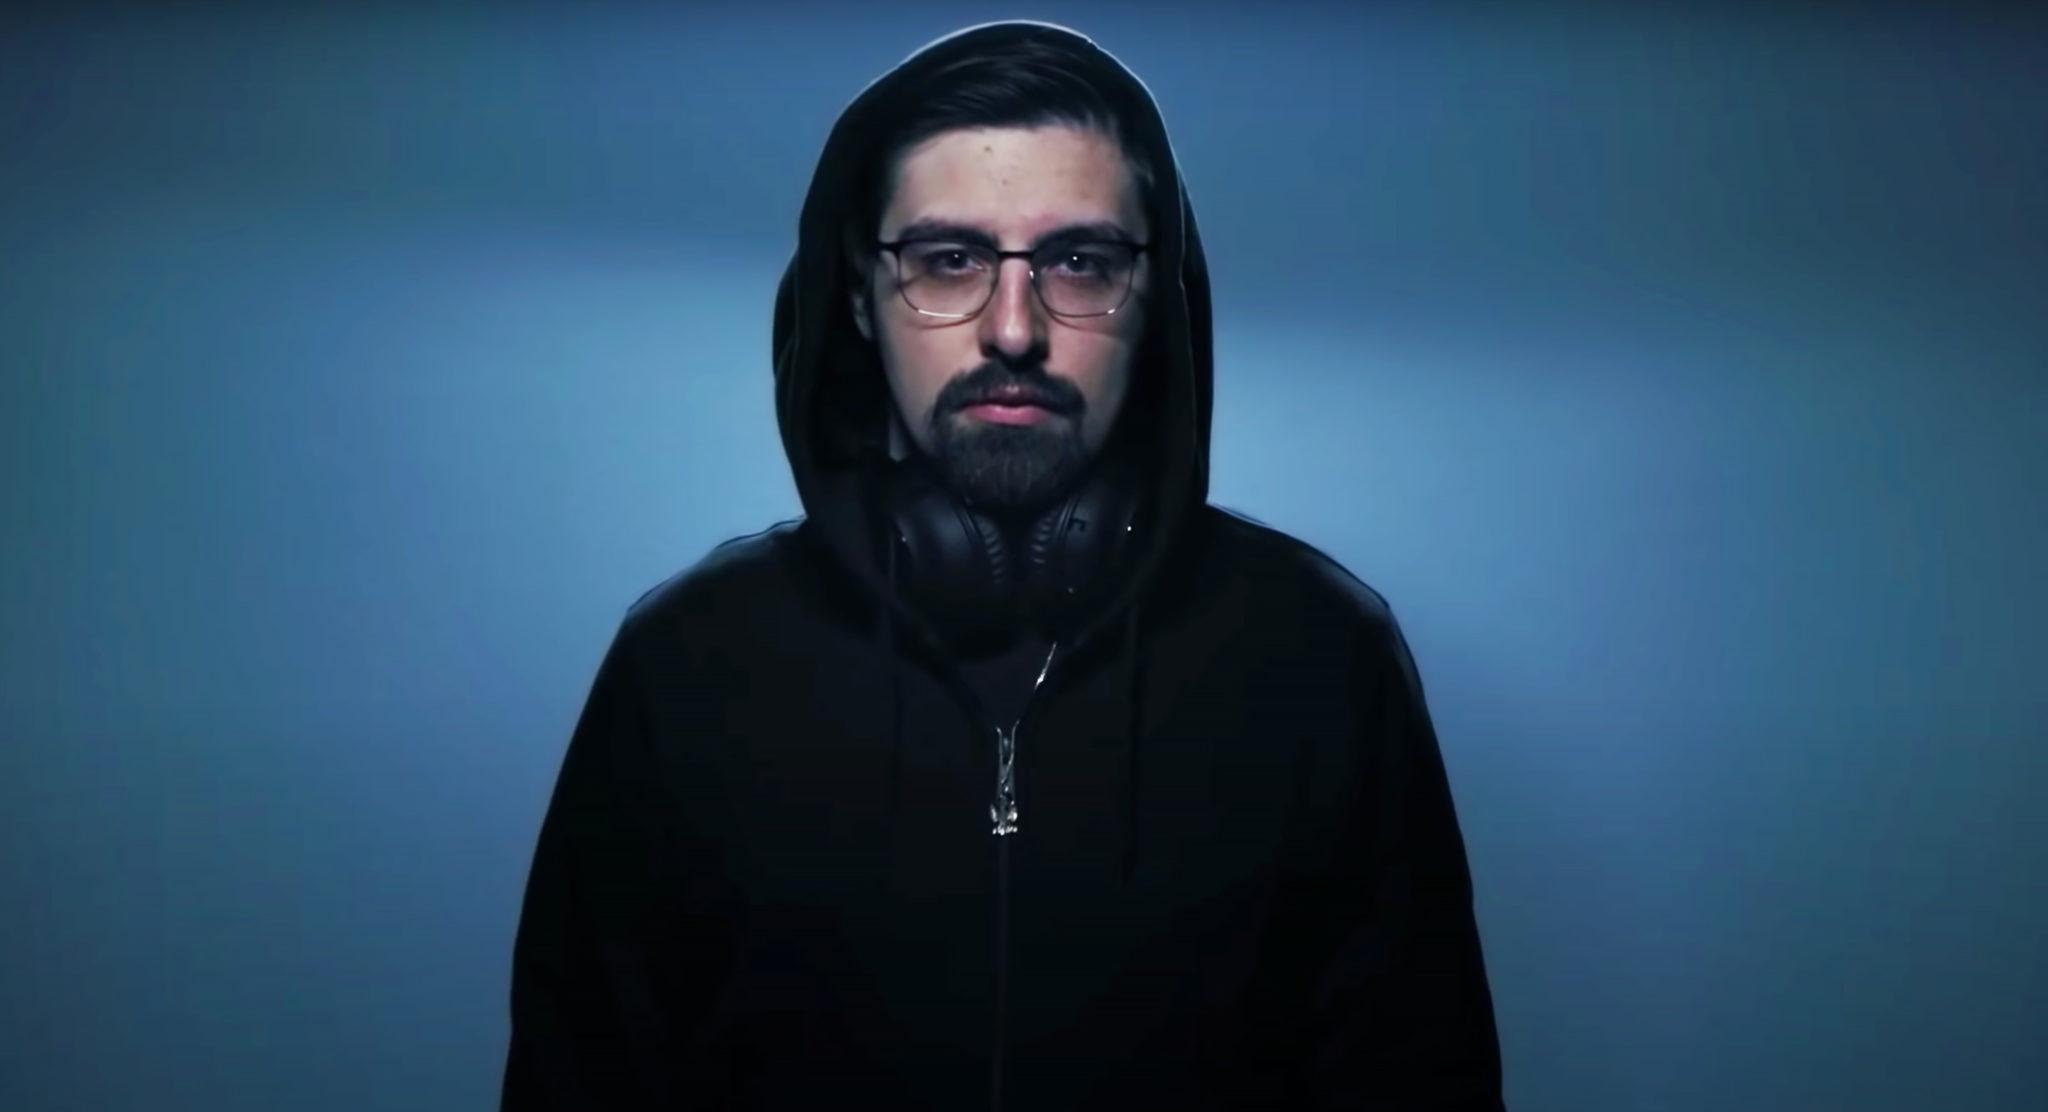 shroud in logitech commercial